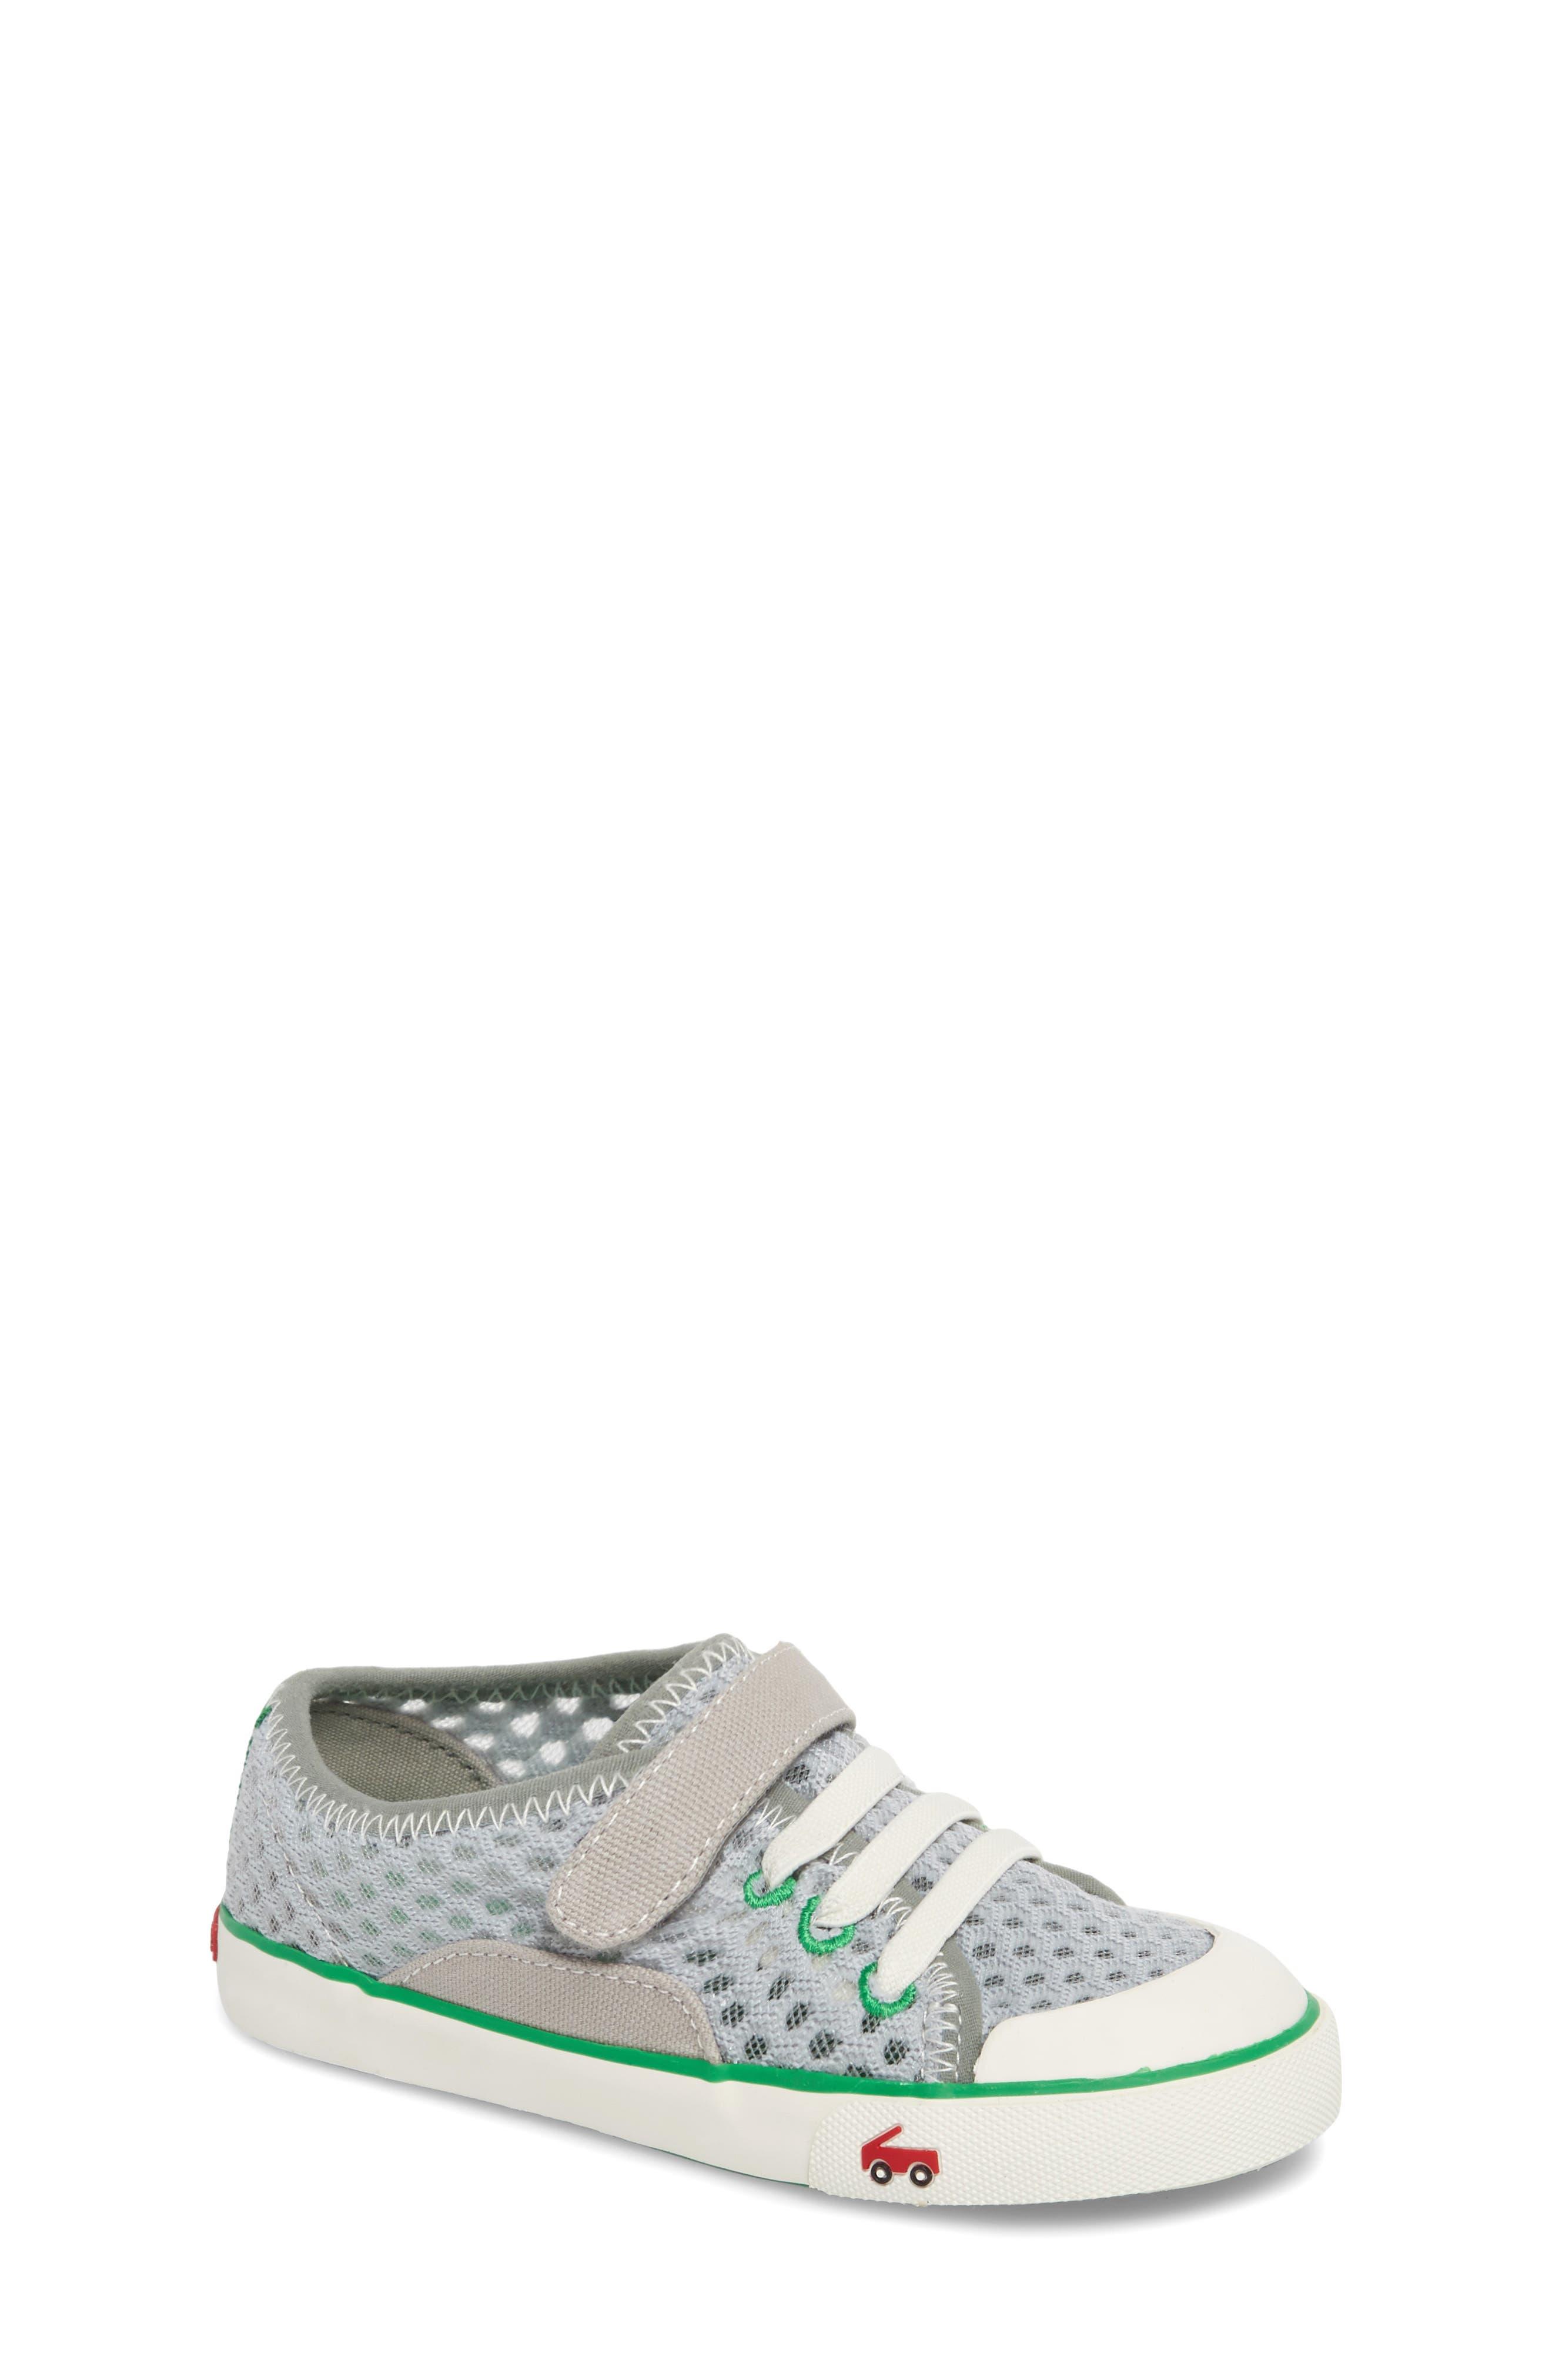 Saylor Sneaker,                         Main,                         color, 020